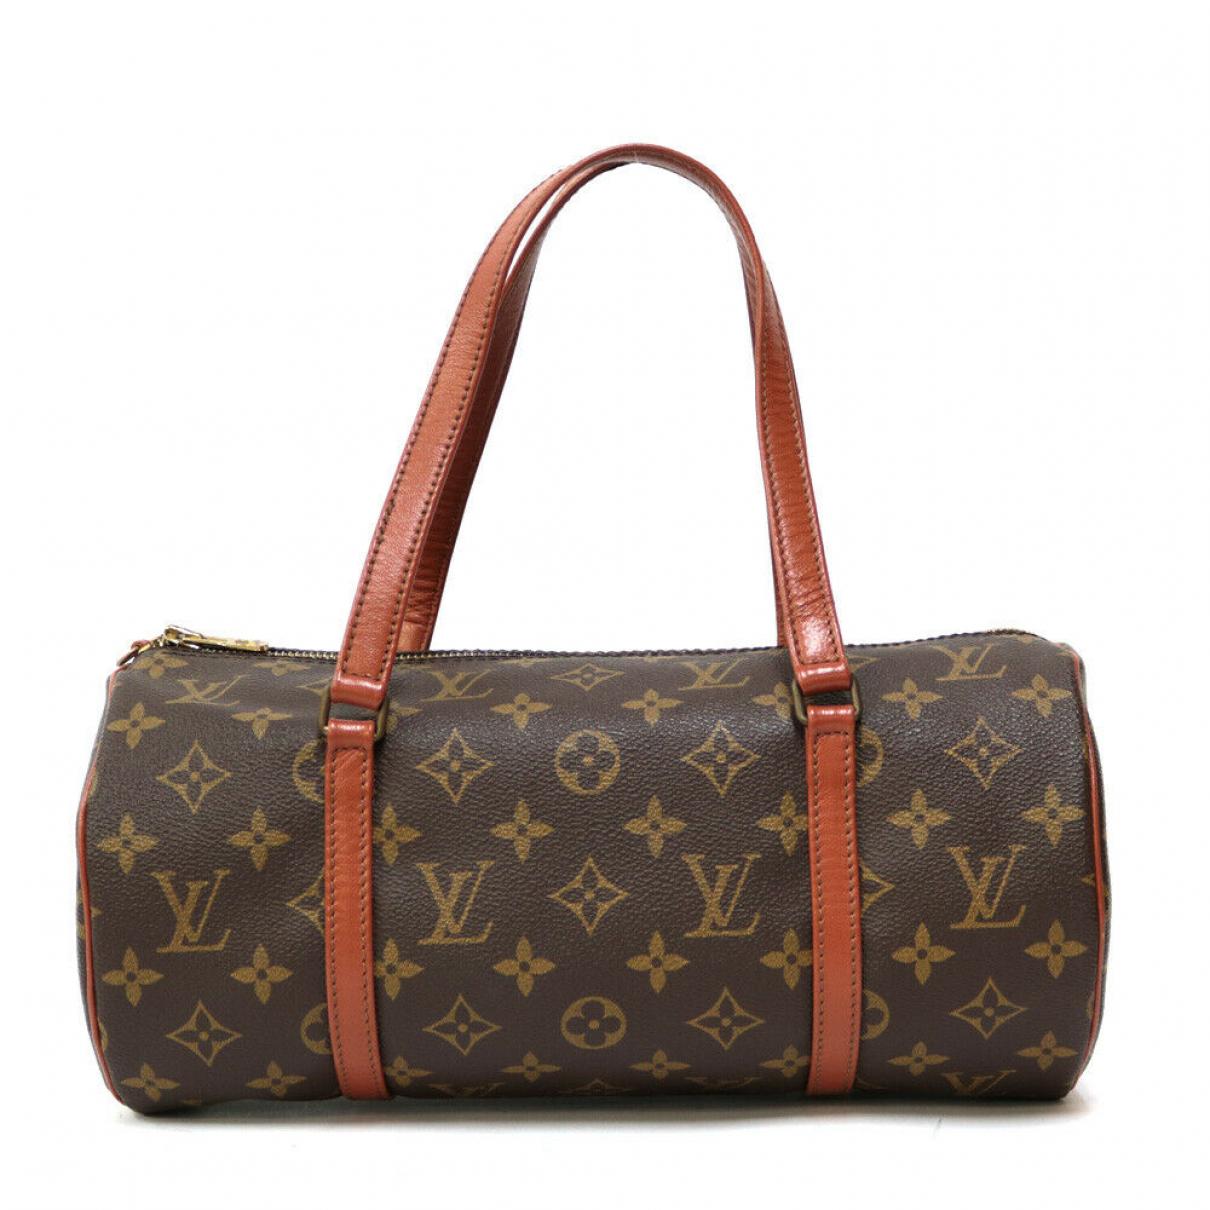 Louis Vuitton N Leather handbag for Women N